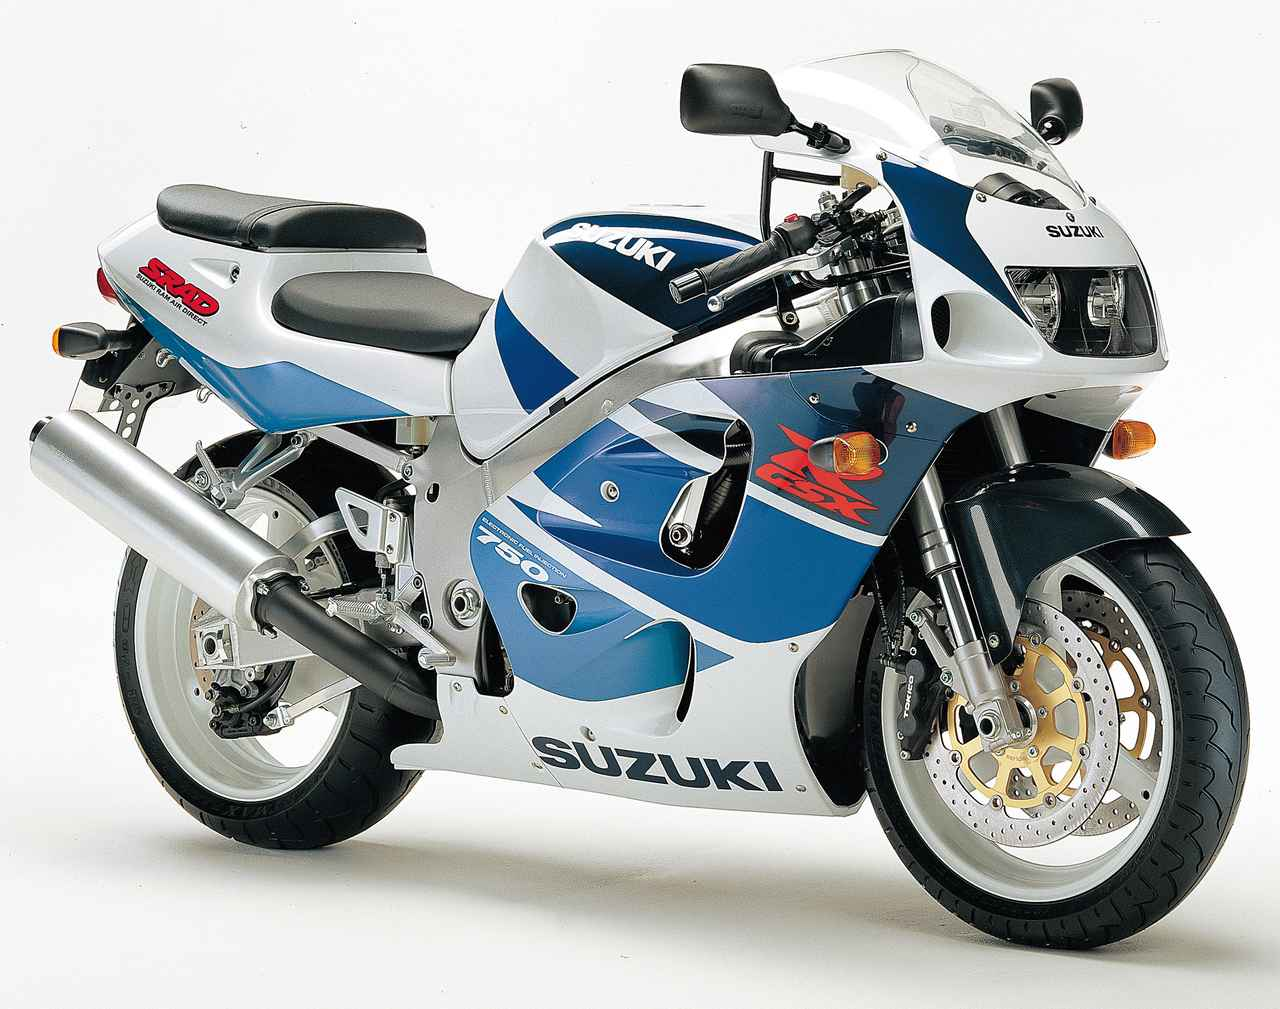 Images : 4番目の画像 - GSX-R750(1992〜2004年)の写真を全て見る! - webオートバイ